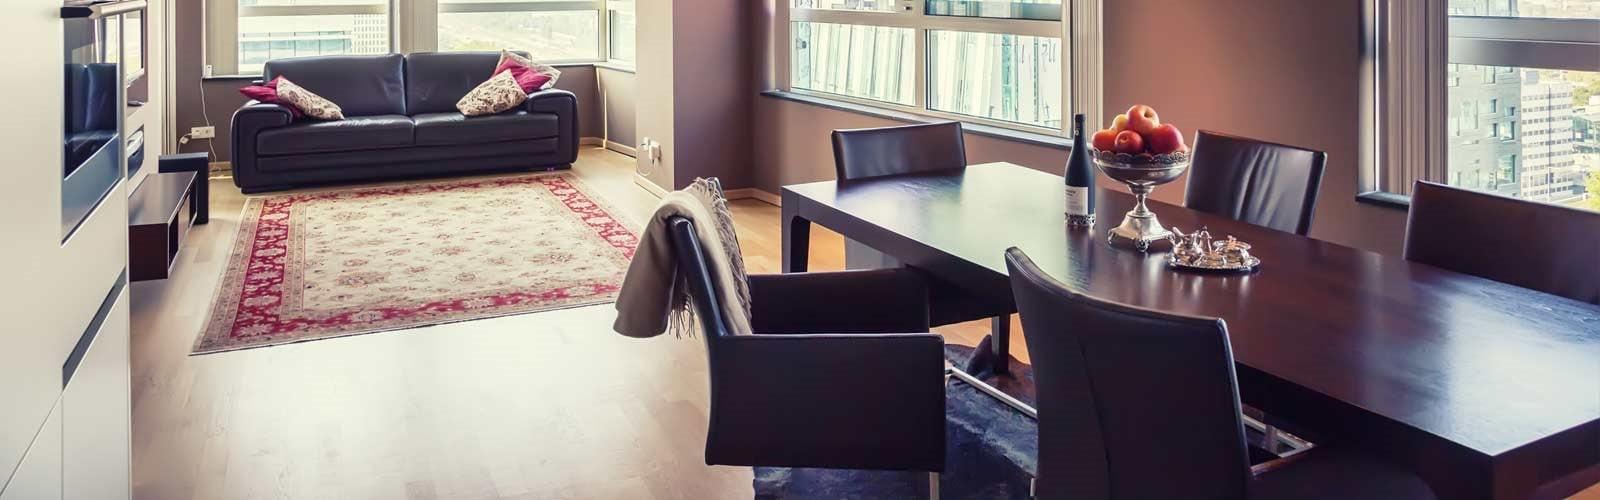 Floor Plans of Mandolin Apartments in Houston, TX